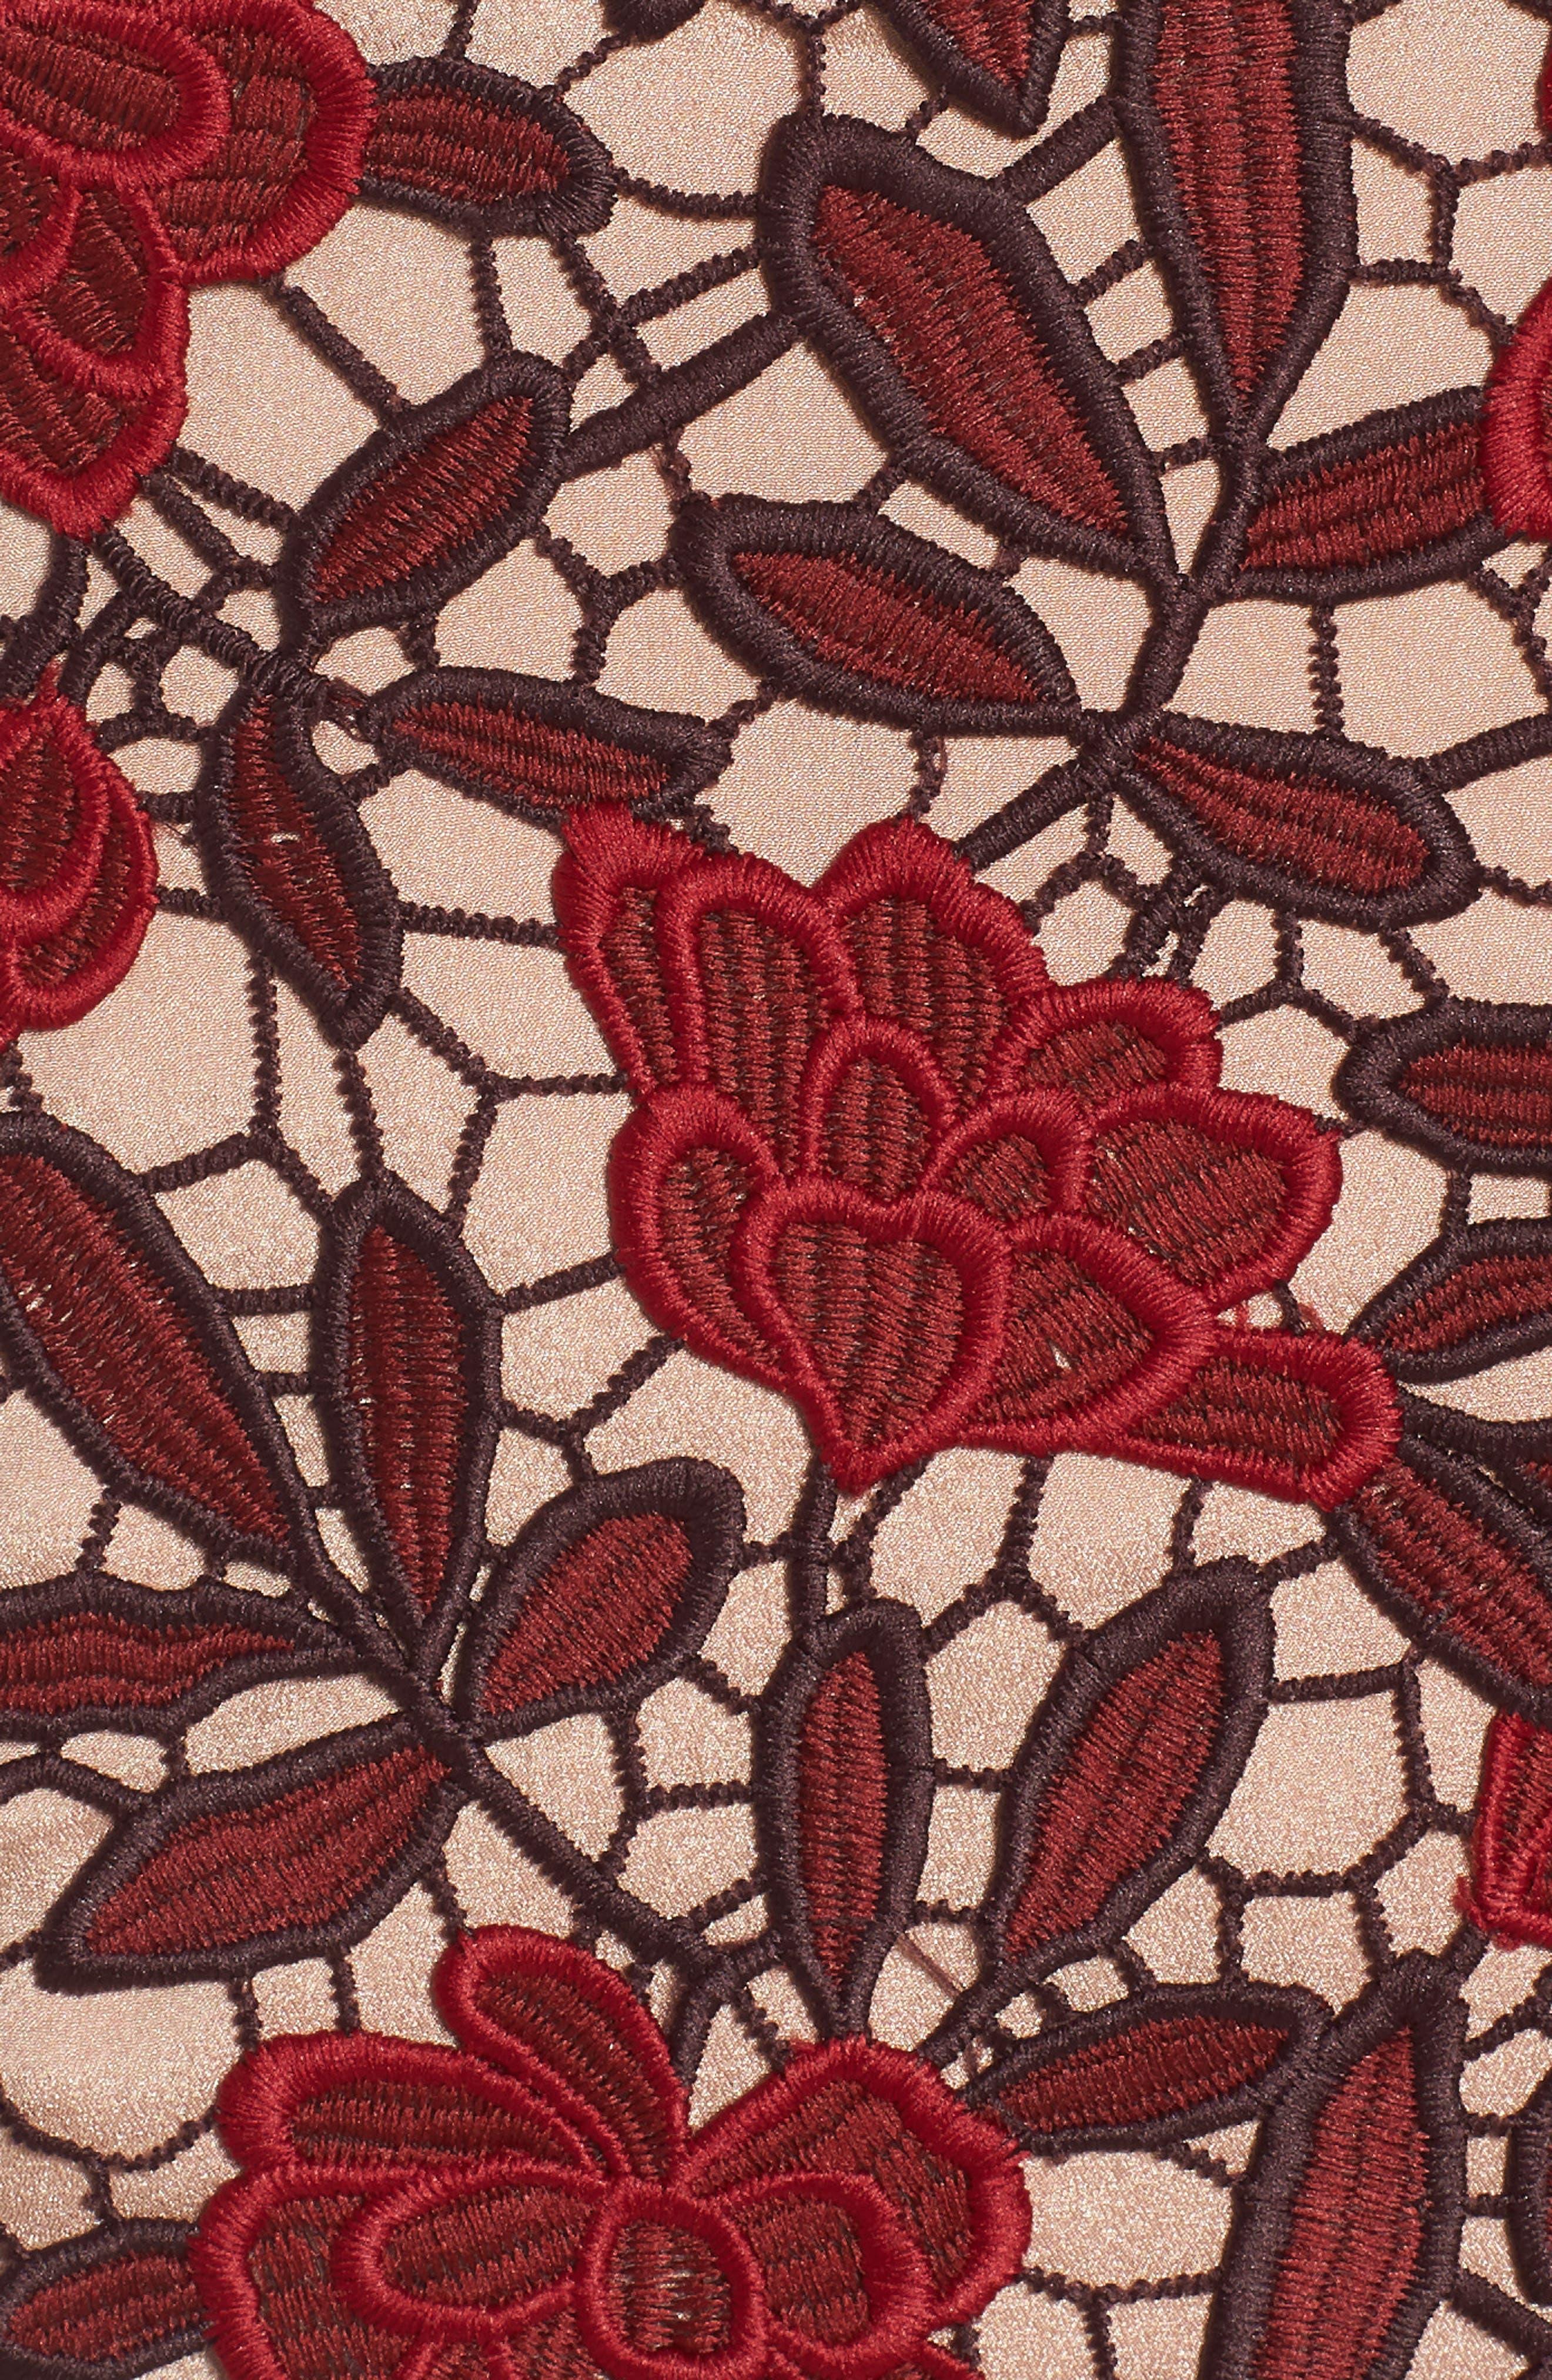 Aurora Embroidered Sheath Dress,                             Alternate thumbnail 7, color,                             GARNET/ NUDE